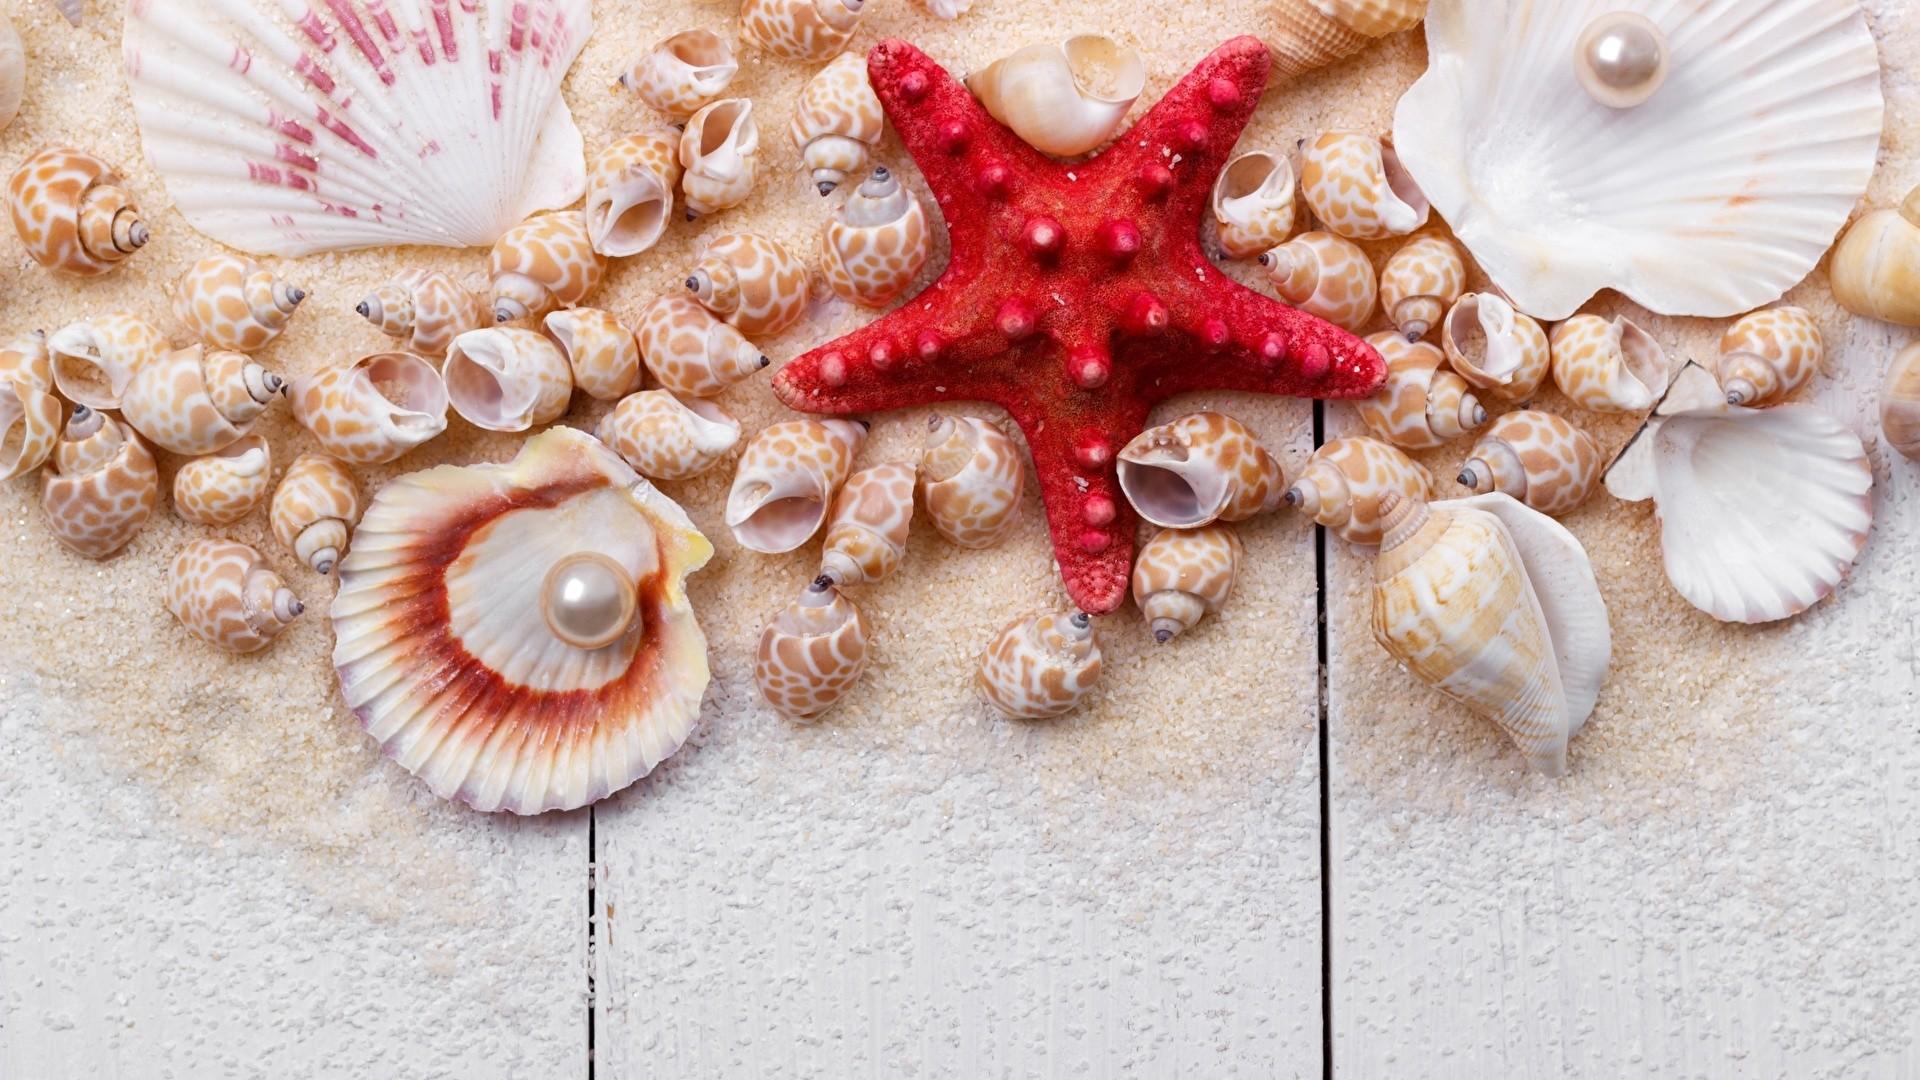 Seashell wallpaper for computer